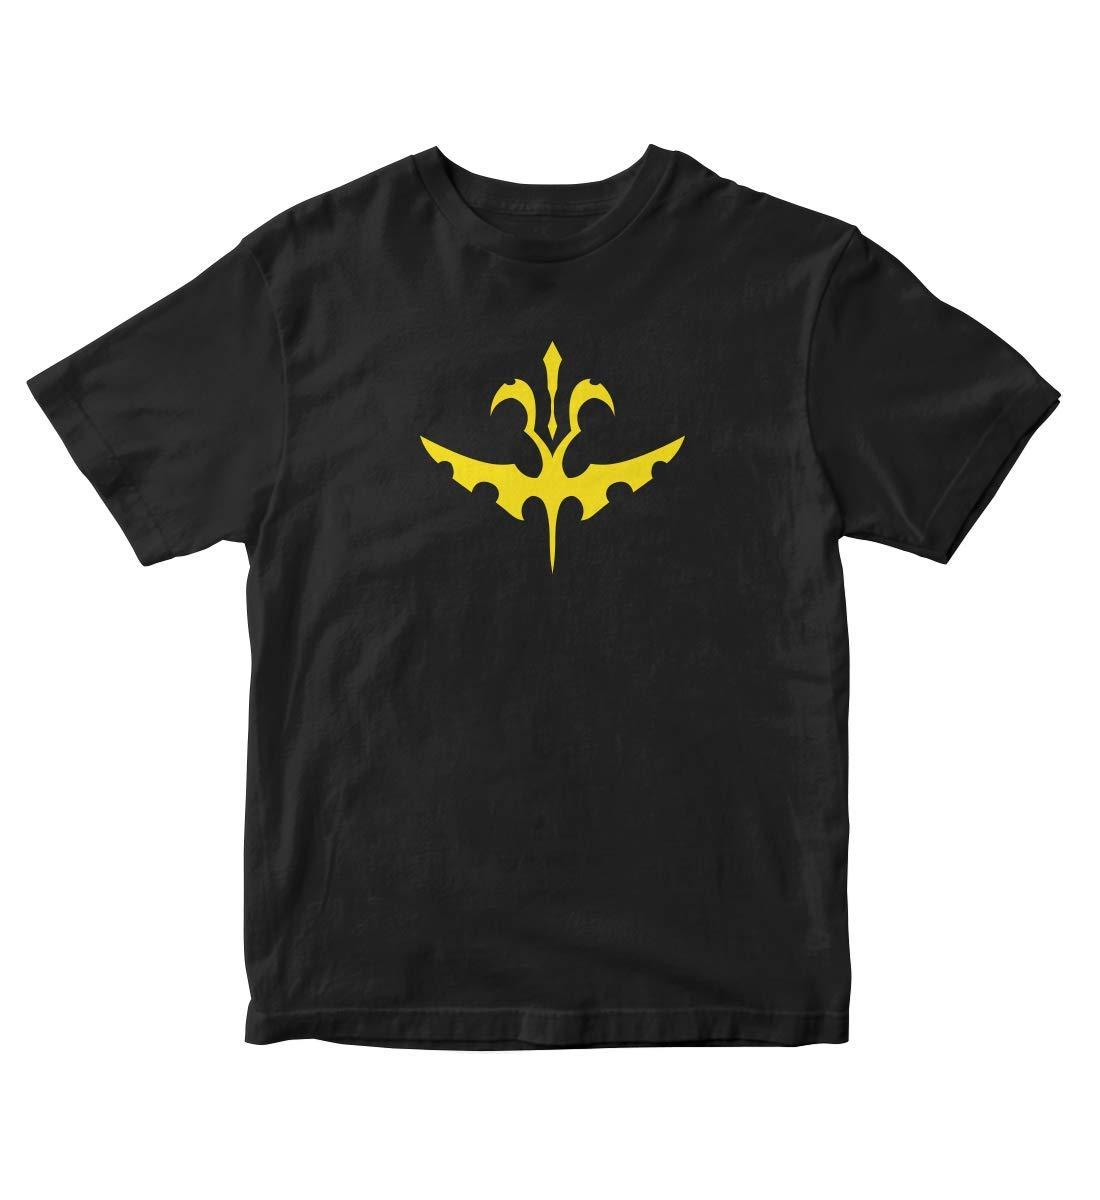 Tjsports Britannian Military Army Symbol Code Geass Lelouch Manga Anime T Shirt A223